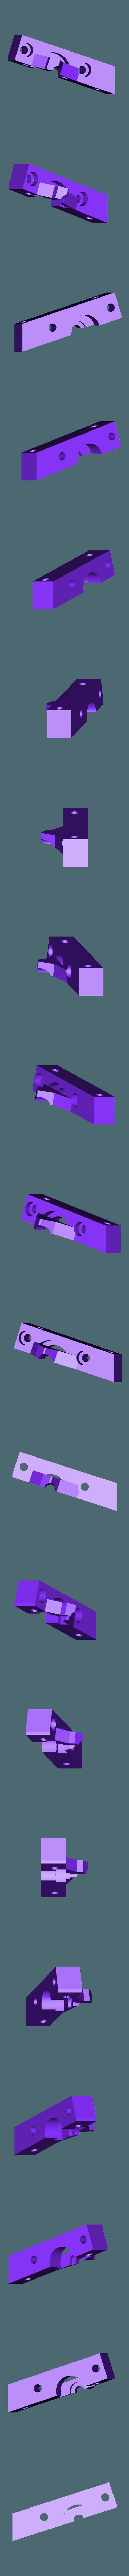 Dual_E3D_Mount_v4-4_MOTOR_CLAMP.STL Download free STL file Jellyfish Mount (RigidBot Dual E3Dv6) • 3D printer object, WalterHsiao